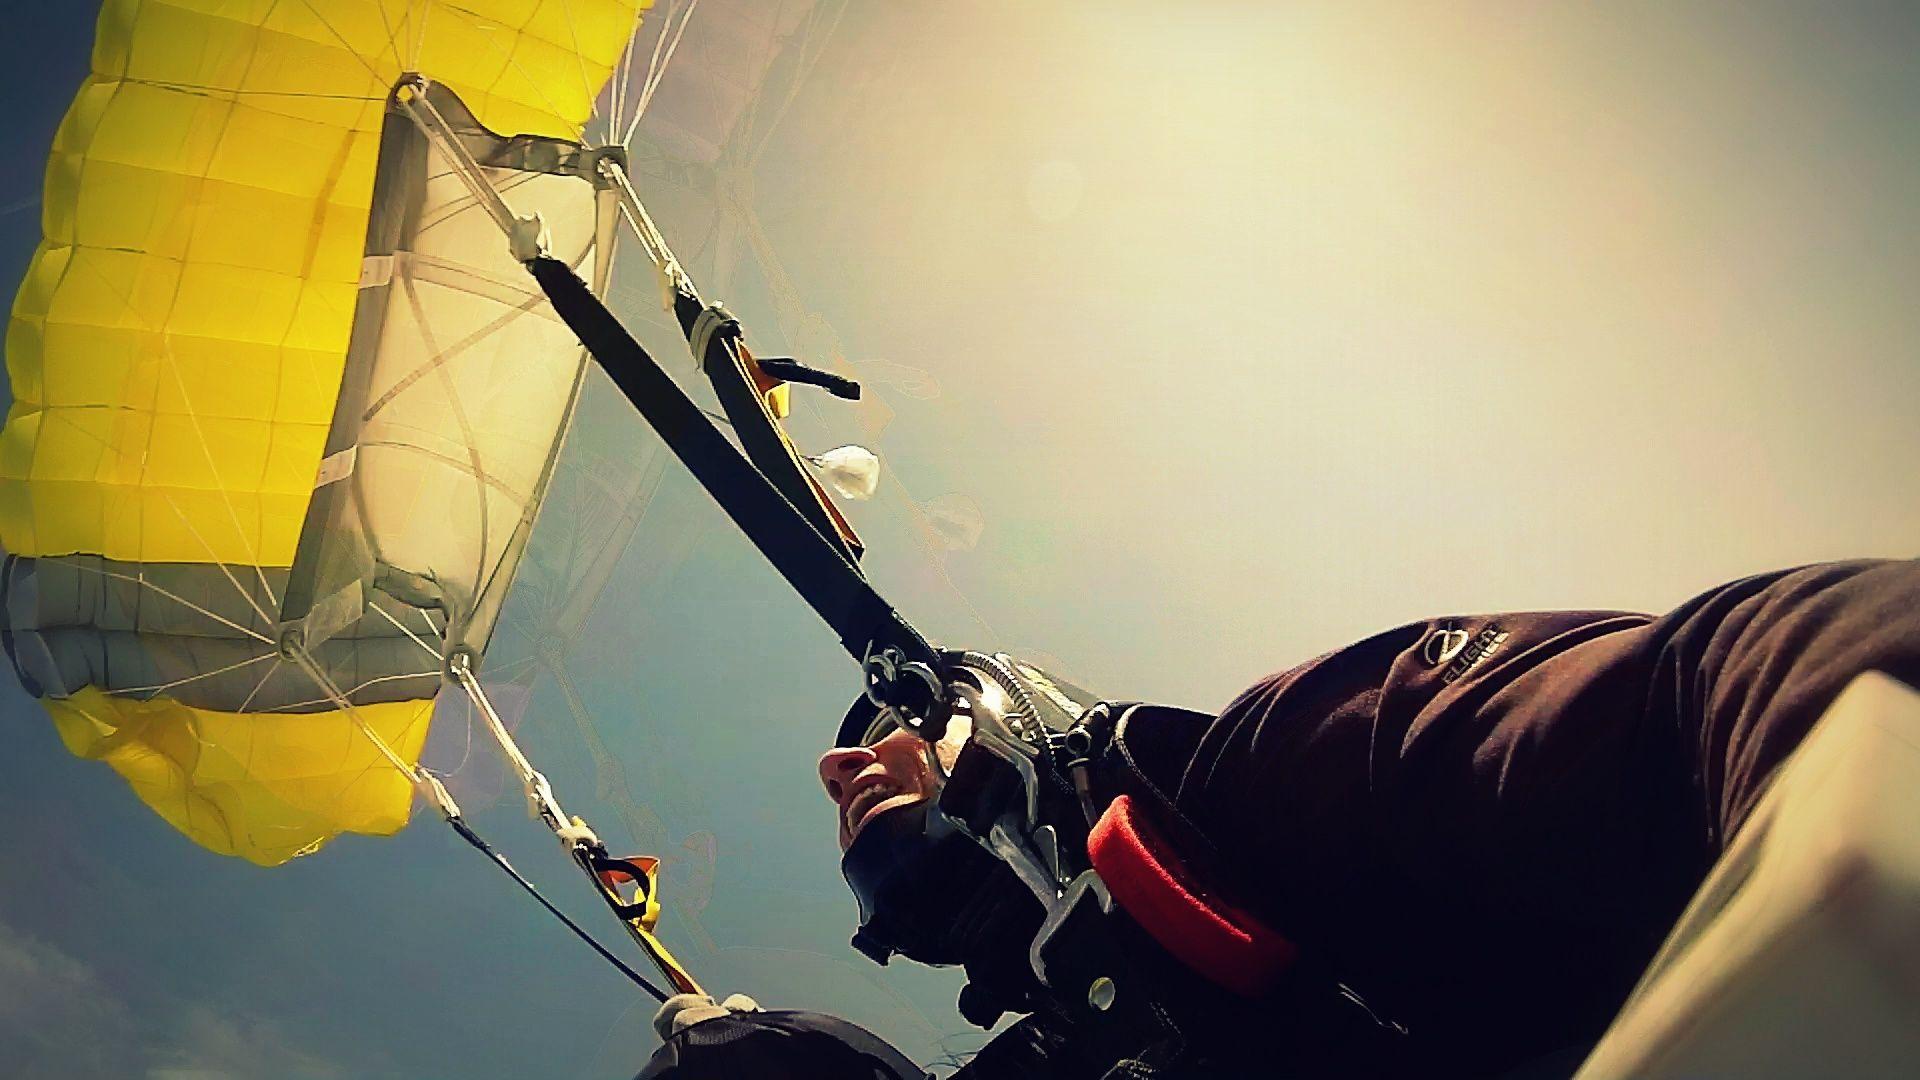 TandemFallschirmspringen Tandemmichl Fallschirmspringen